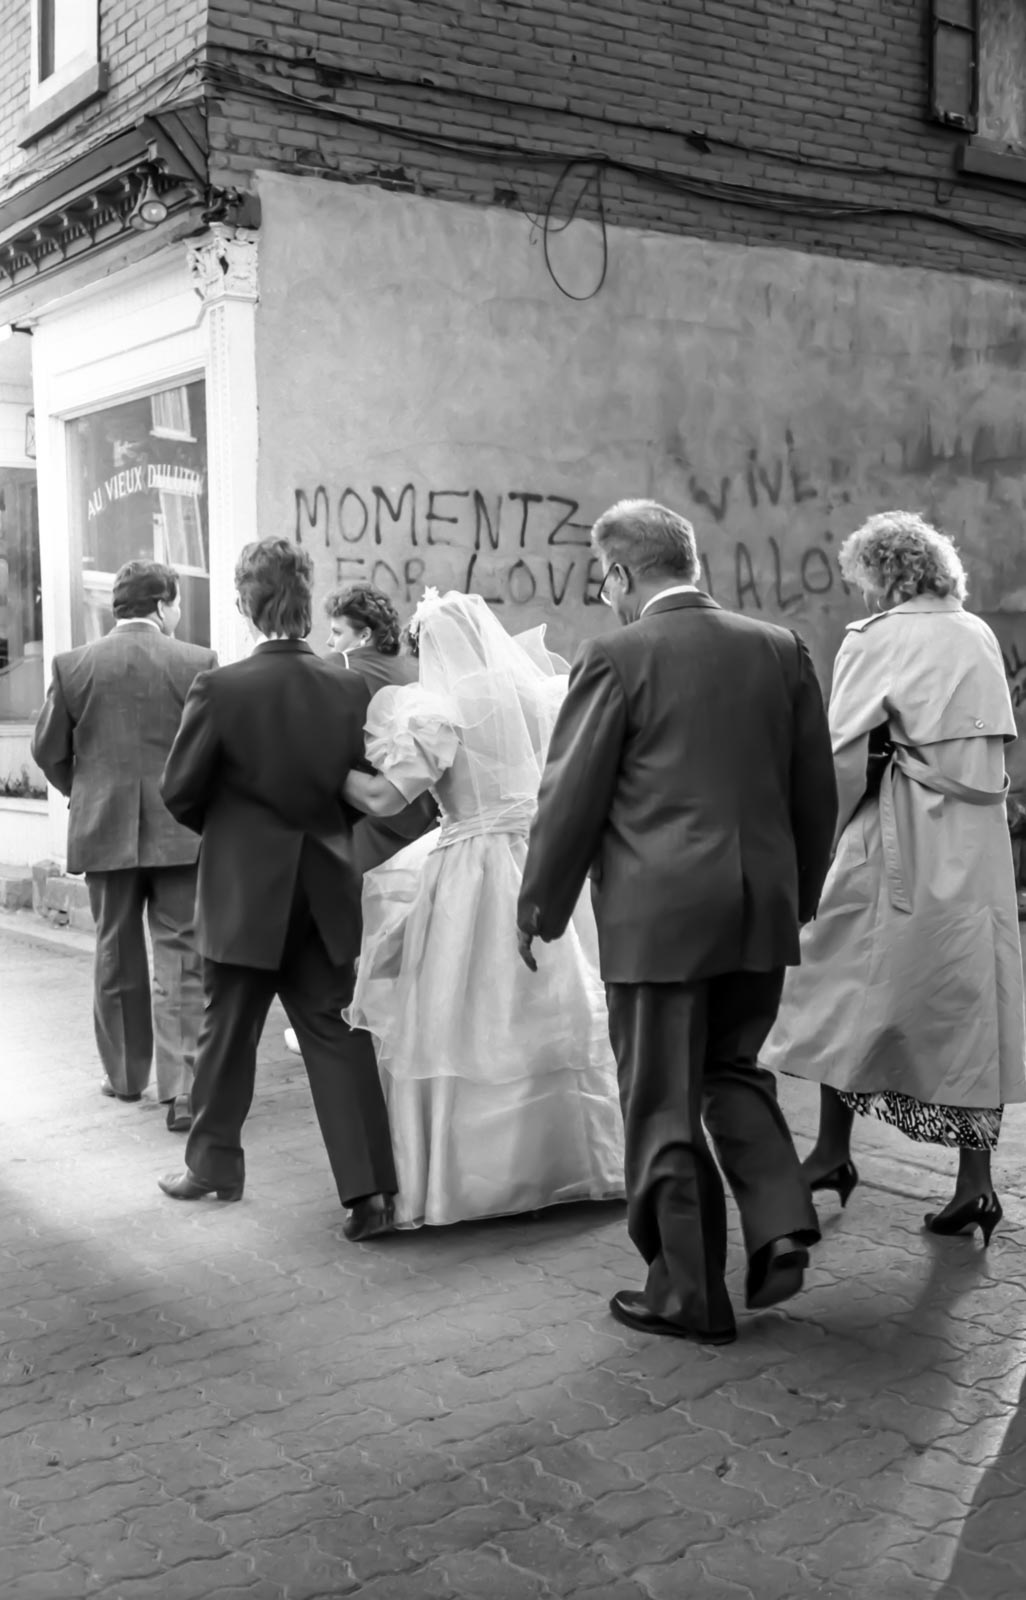 Momentz for love, Montréal 1989